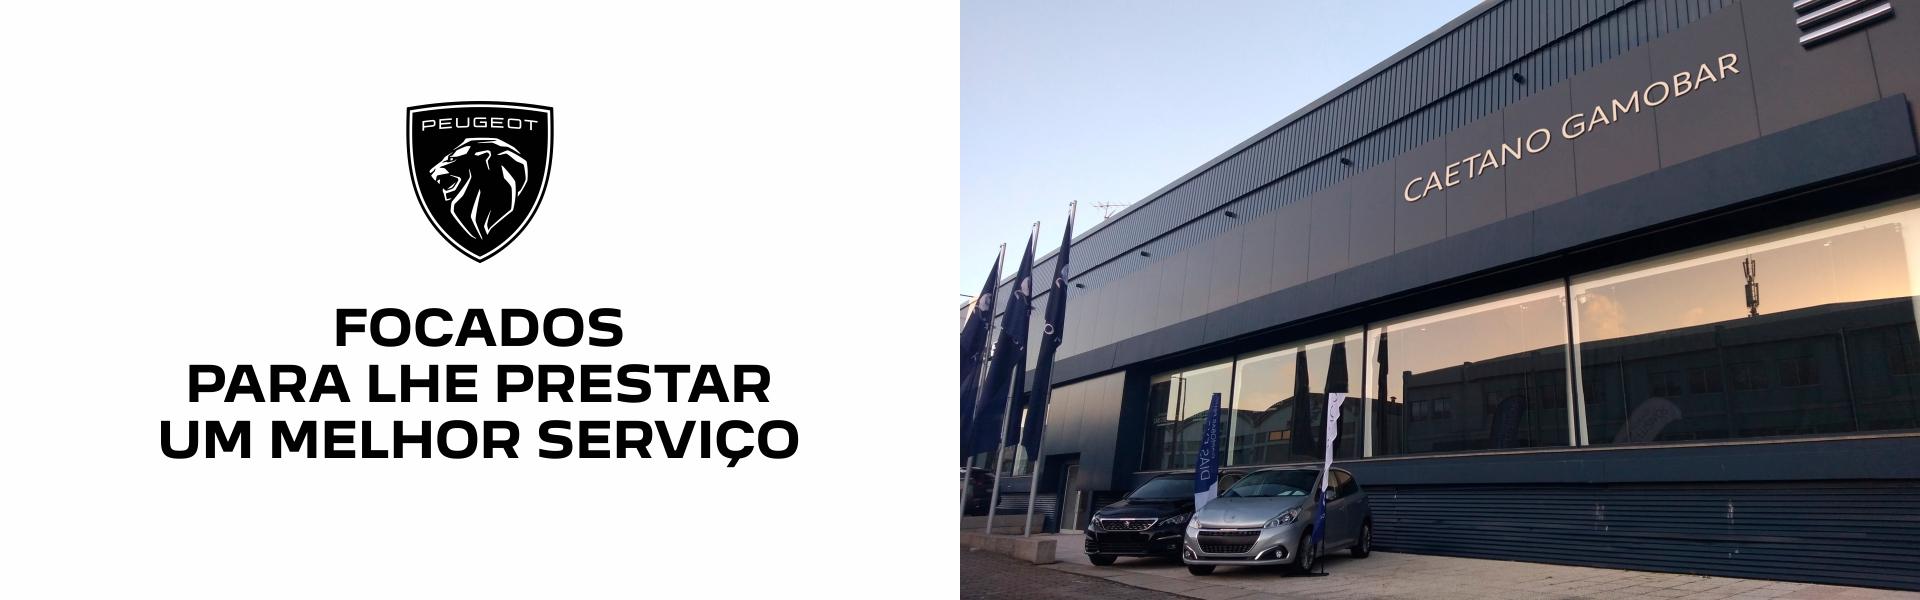 melhor serviço Peugeot